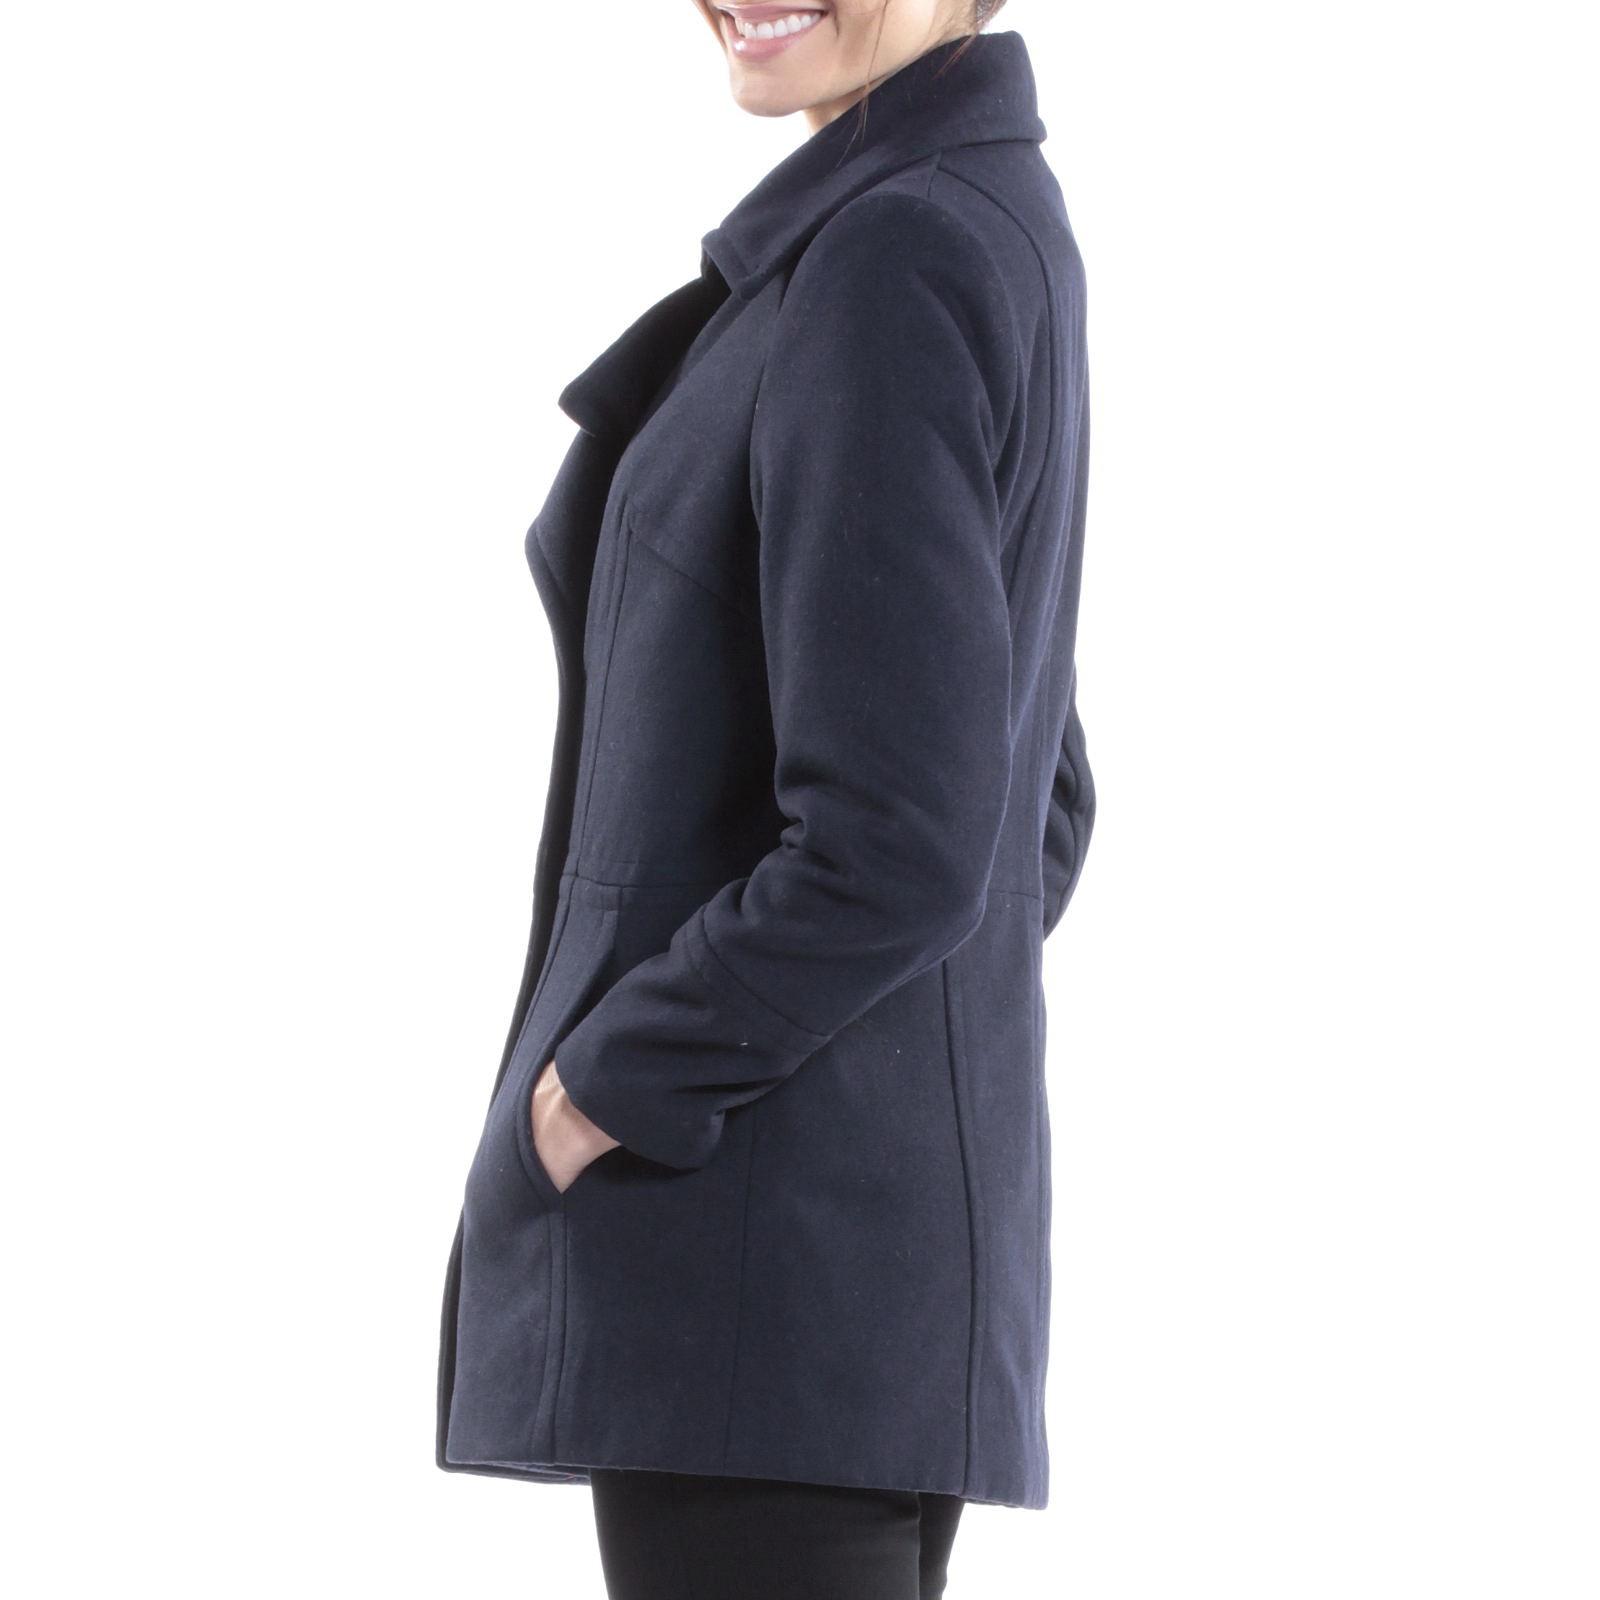 Alpine-Swiss-Emma-Womens-Peacoat-Jacket-Wool-Blazer-Double-Breasted-Overcoat-New thumbnail 51